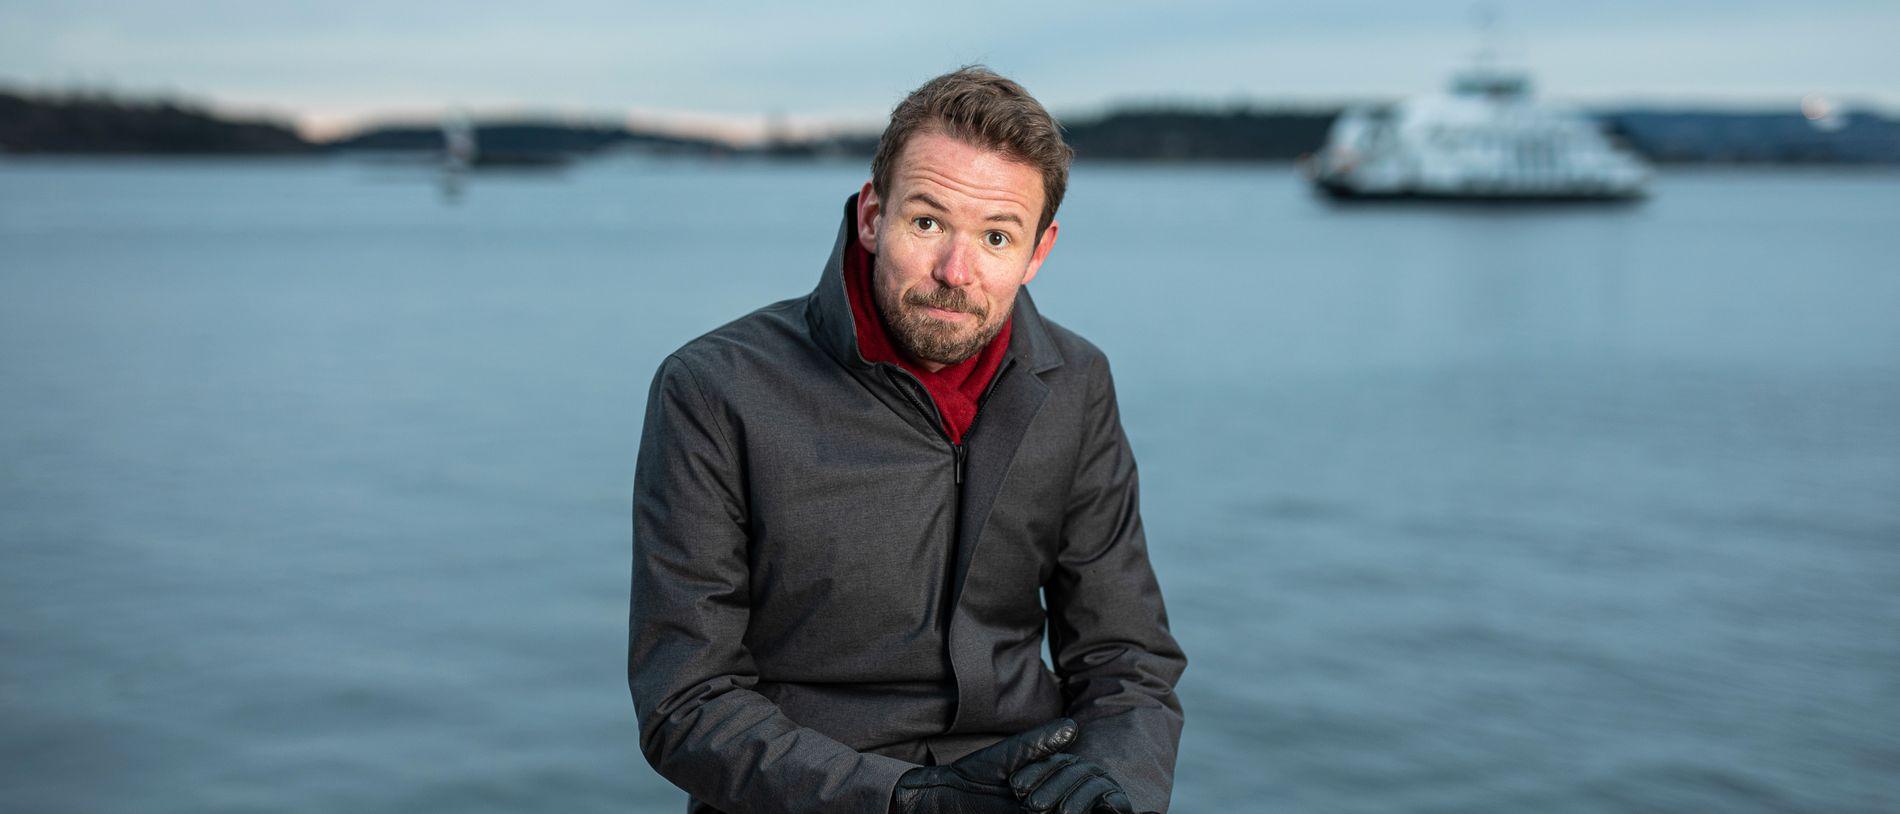 Norge enda älskarinnor sexuell energi milfs